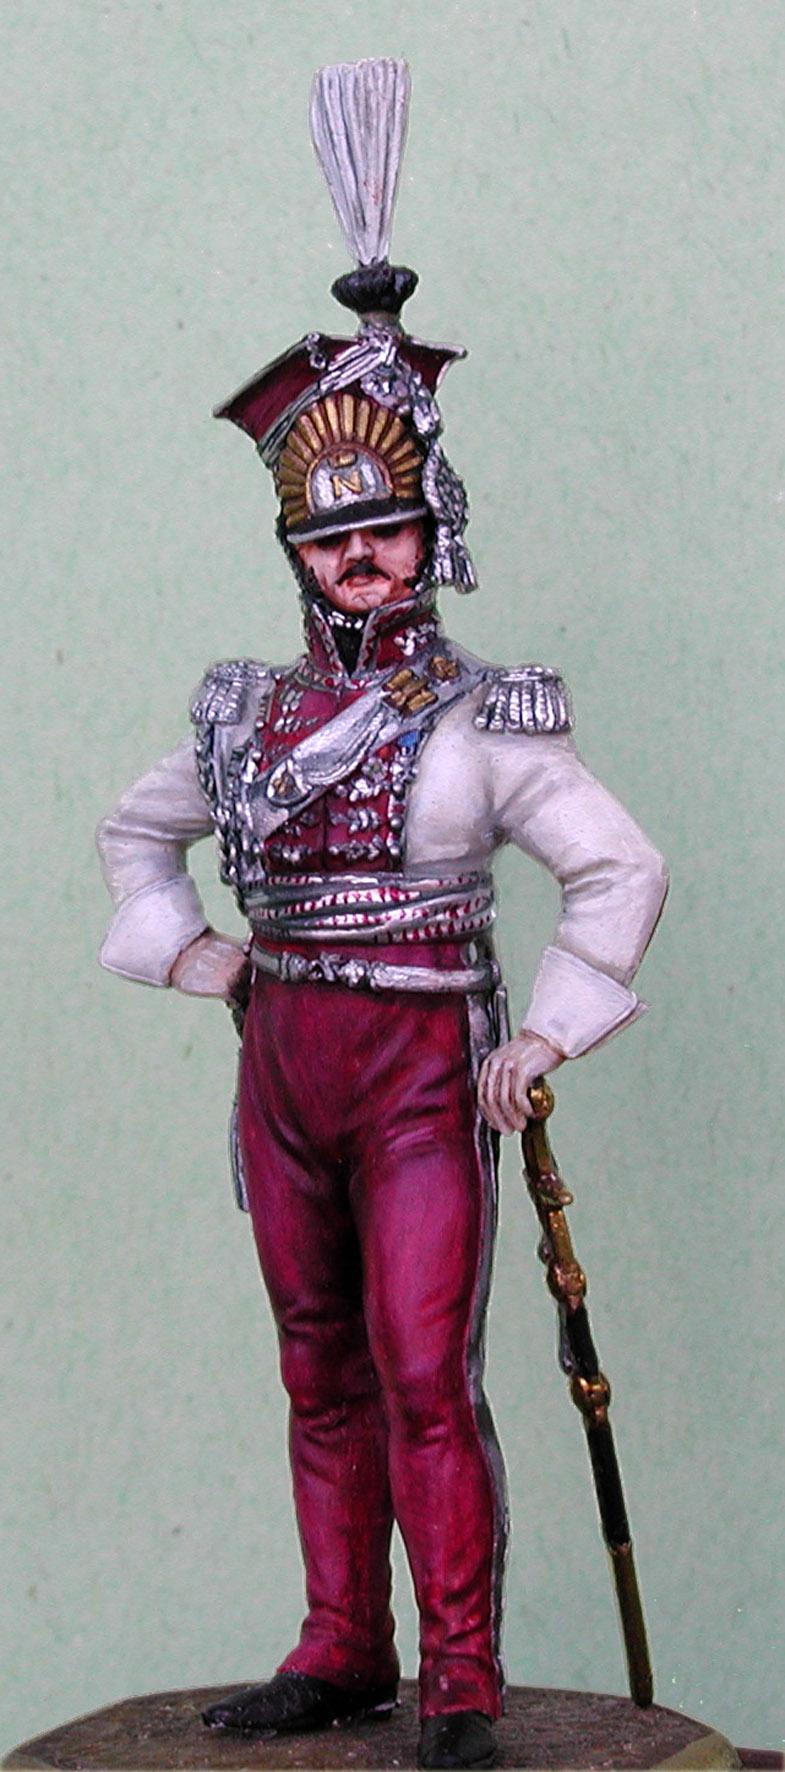 Vitrine de MarcM, Murat en amiral napolitain - Page 2 Krasin10